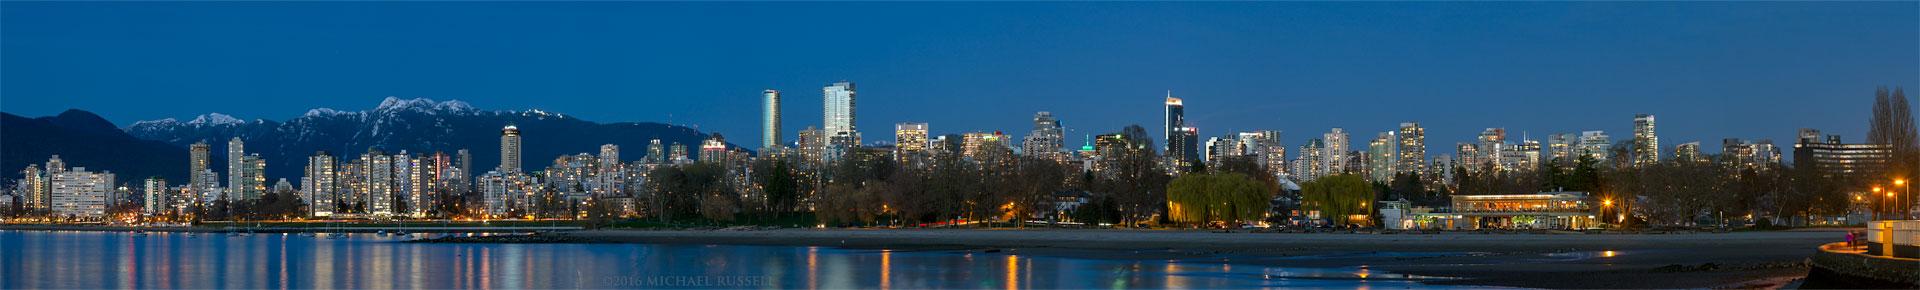 panorama of vancouvers english bay kitsilano and city buildings from kits beach